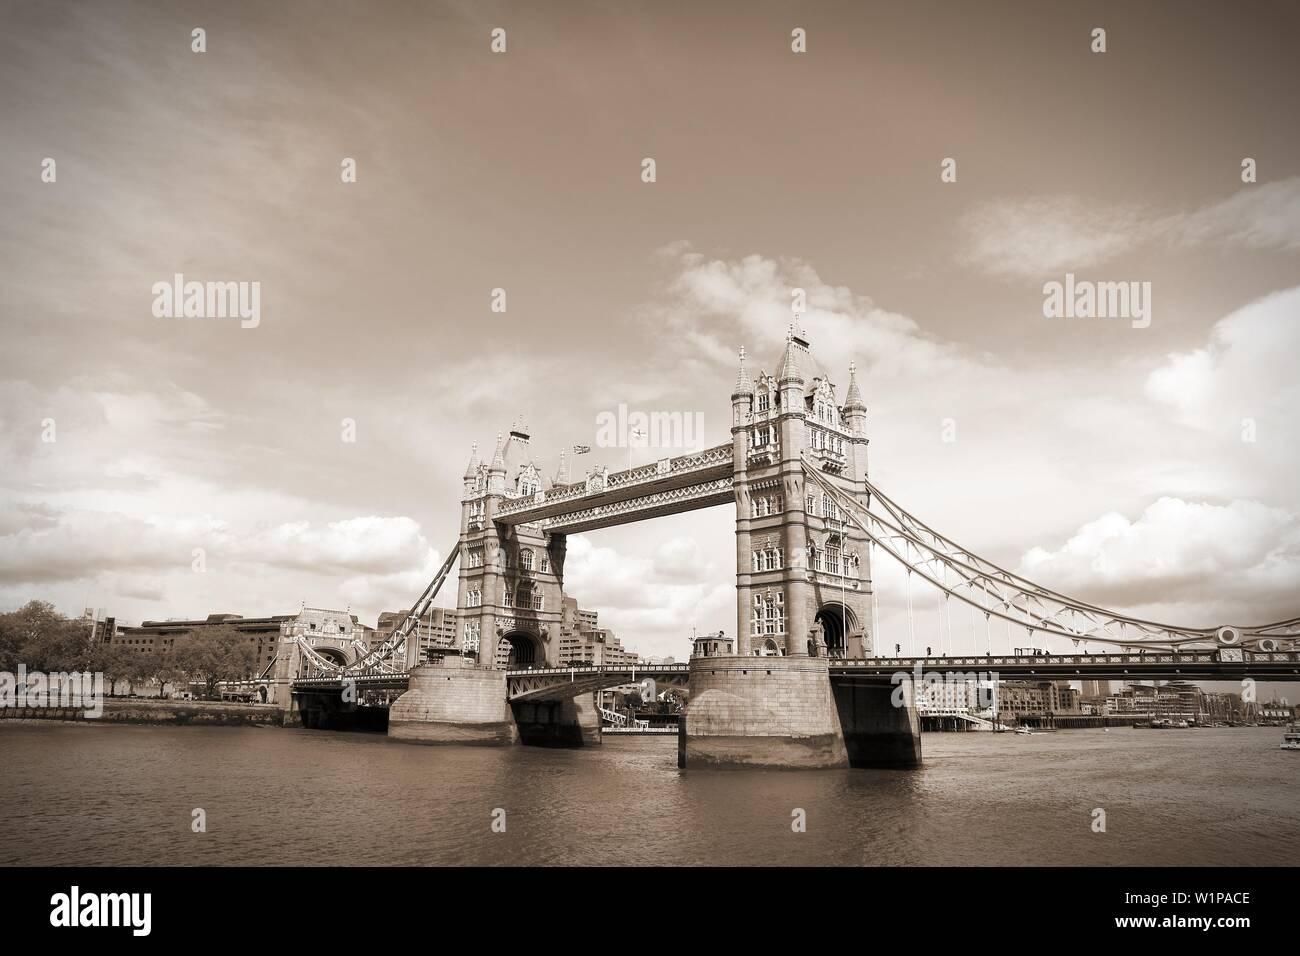 London, United Kingdom - famous Tower Bridge. Old landmark. Sepia tone - filtered retro style monochrome photo. - Stock Image